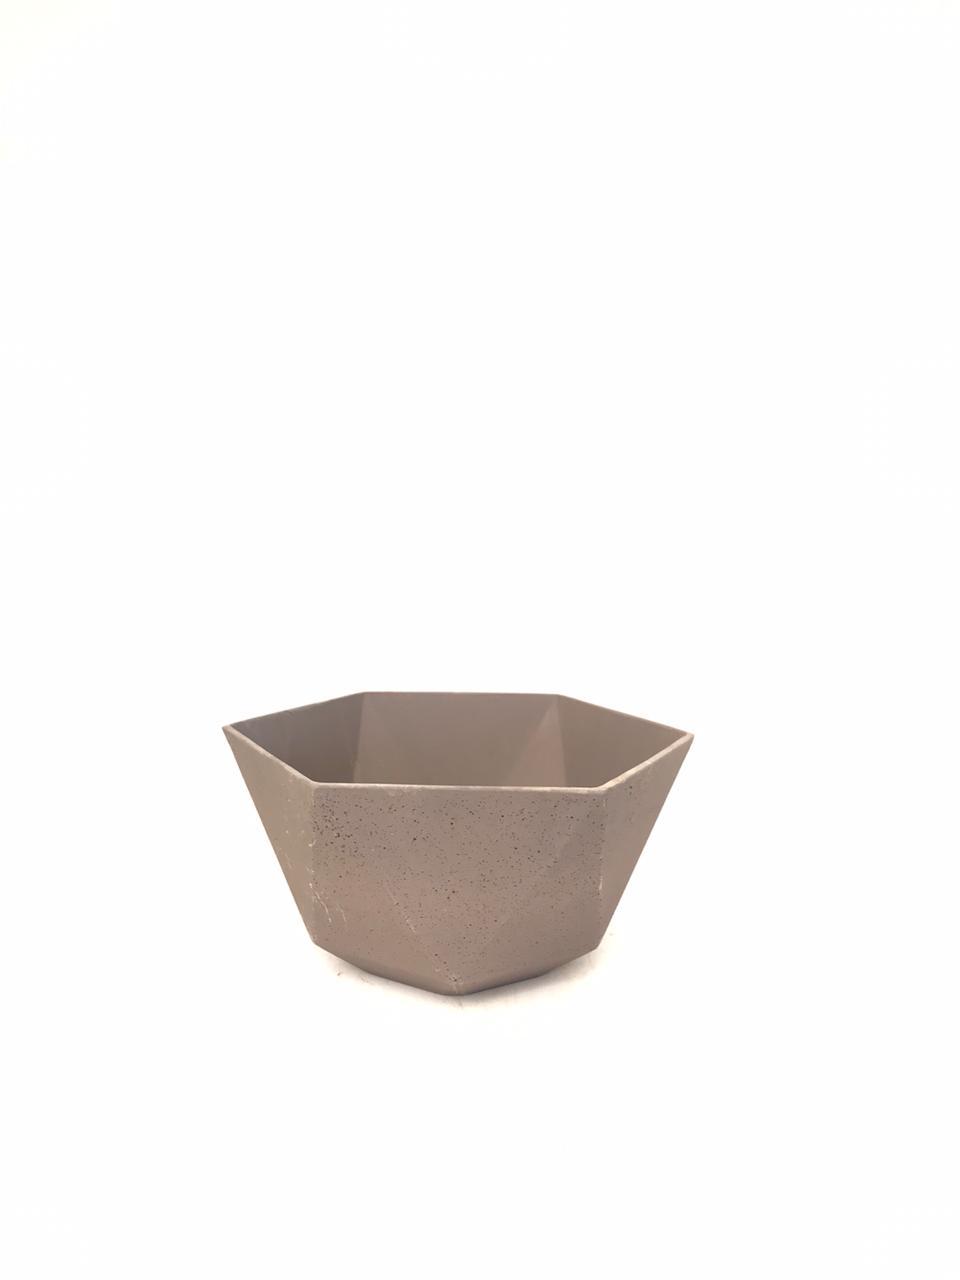 Sandstone Pot Hex Brown Small Pots & Vases